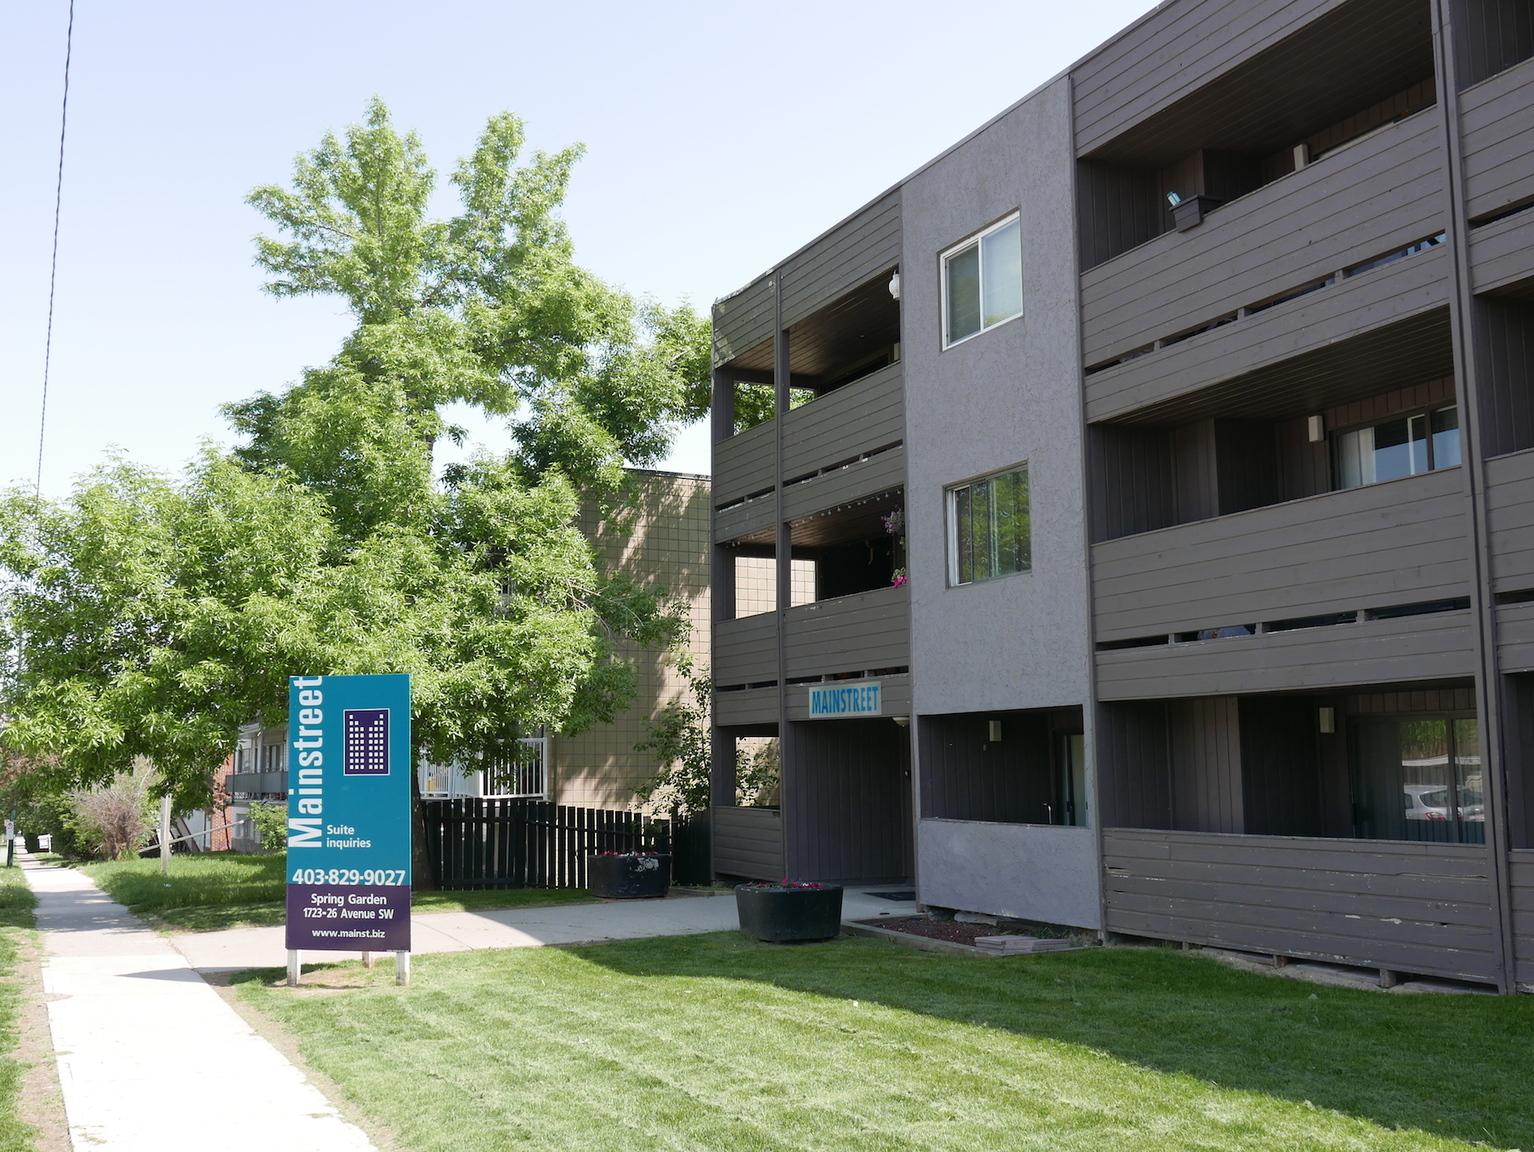 1723 26 Avenue SW, Calgary, AB - 950 CAD/ month